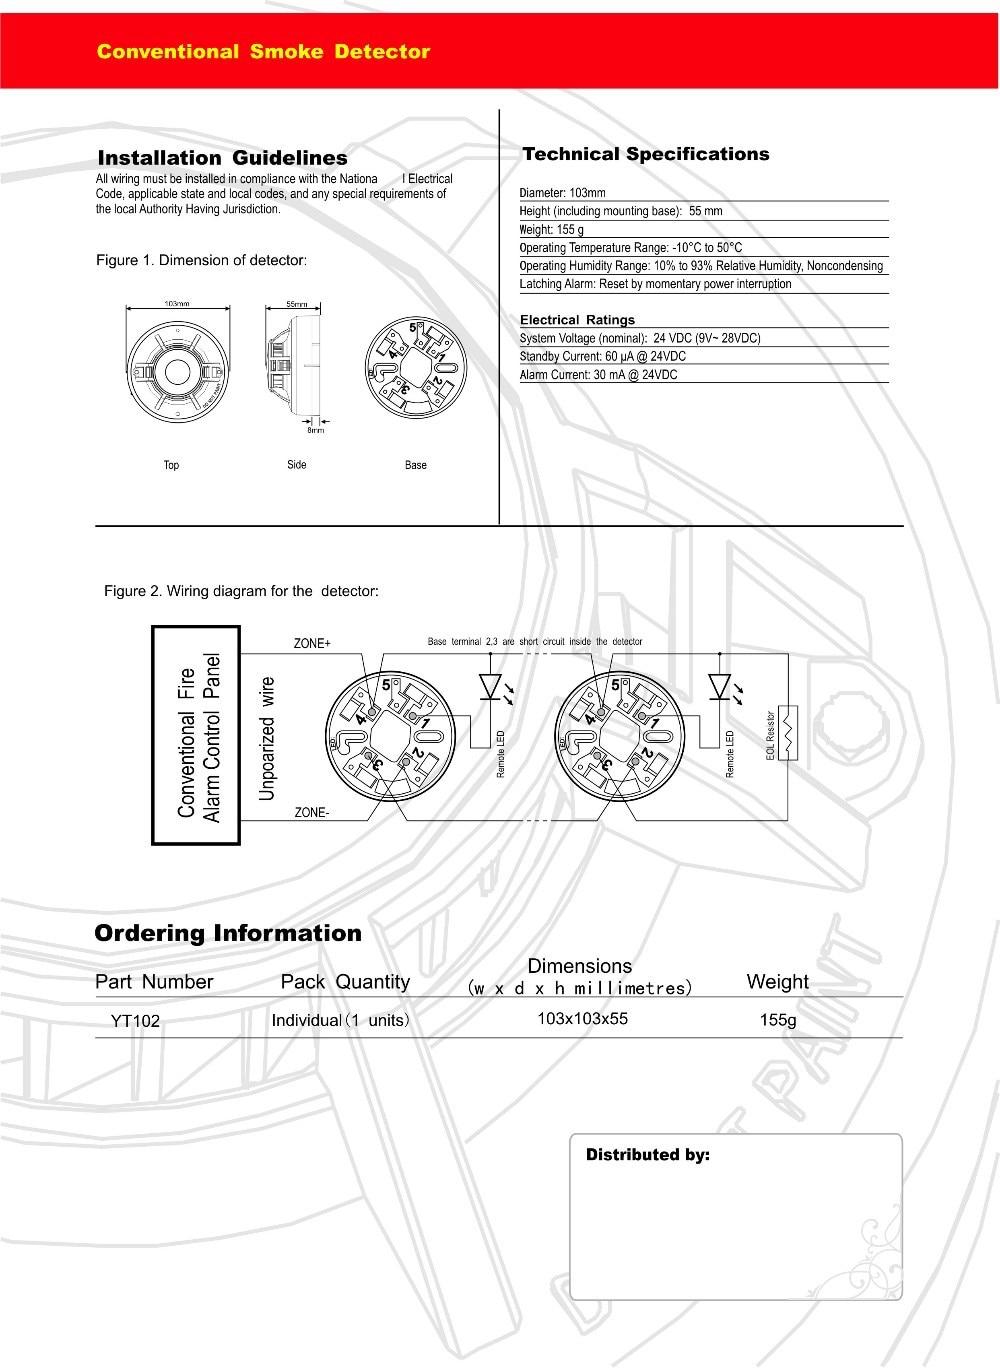 conventional fire alarm panel wiring diagram advance mark 10 ballast detector library 2 wire smoke optical rh aliexpress com system sensor